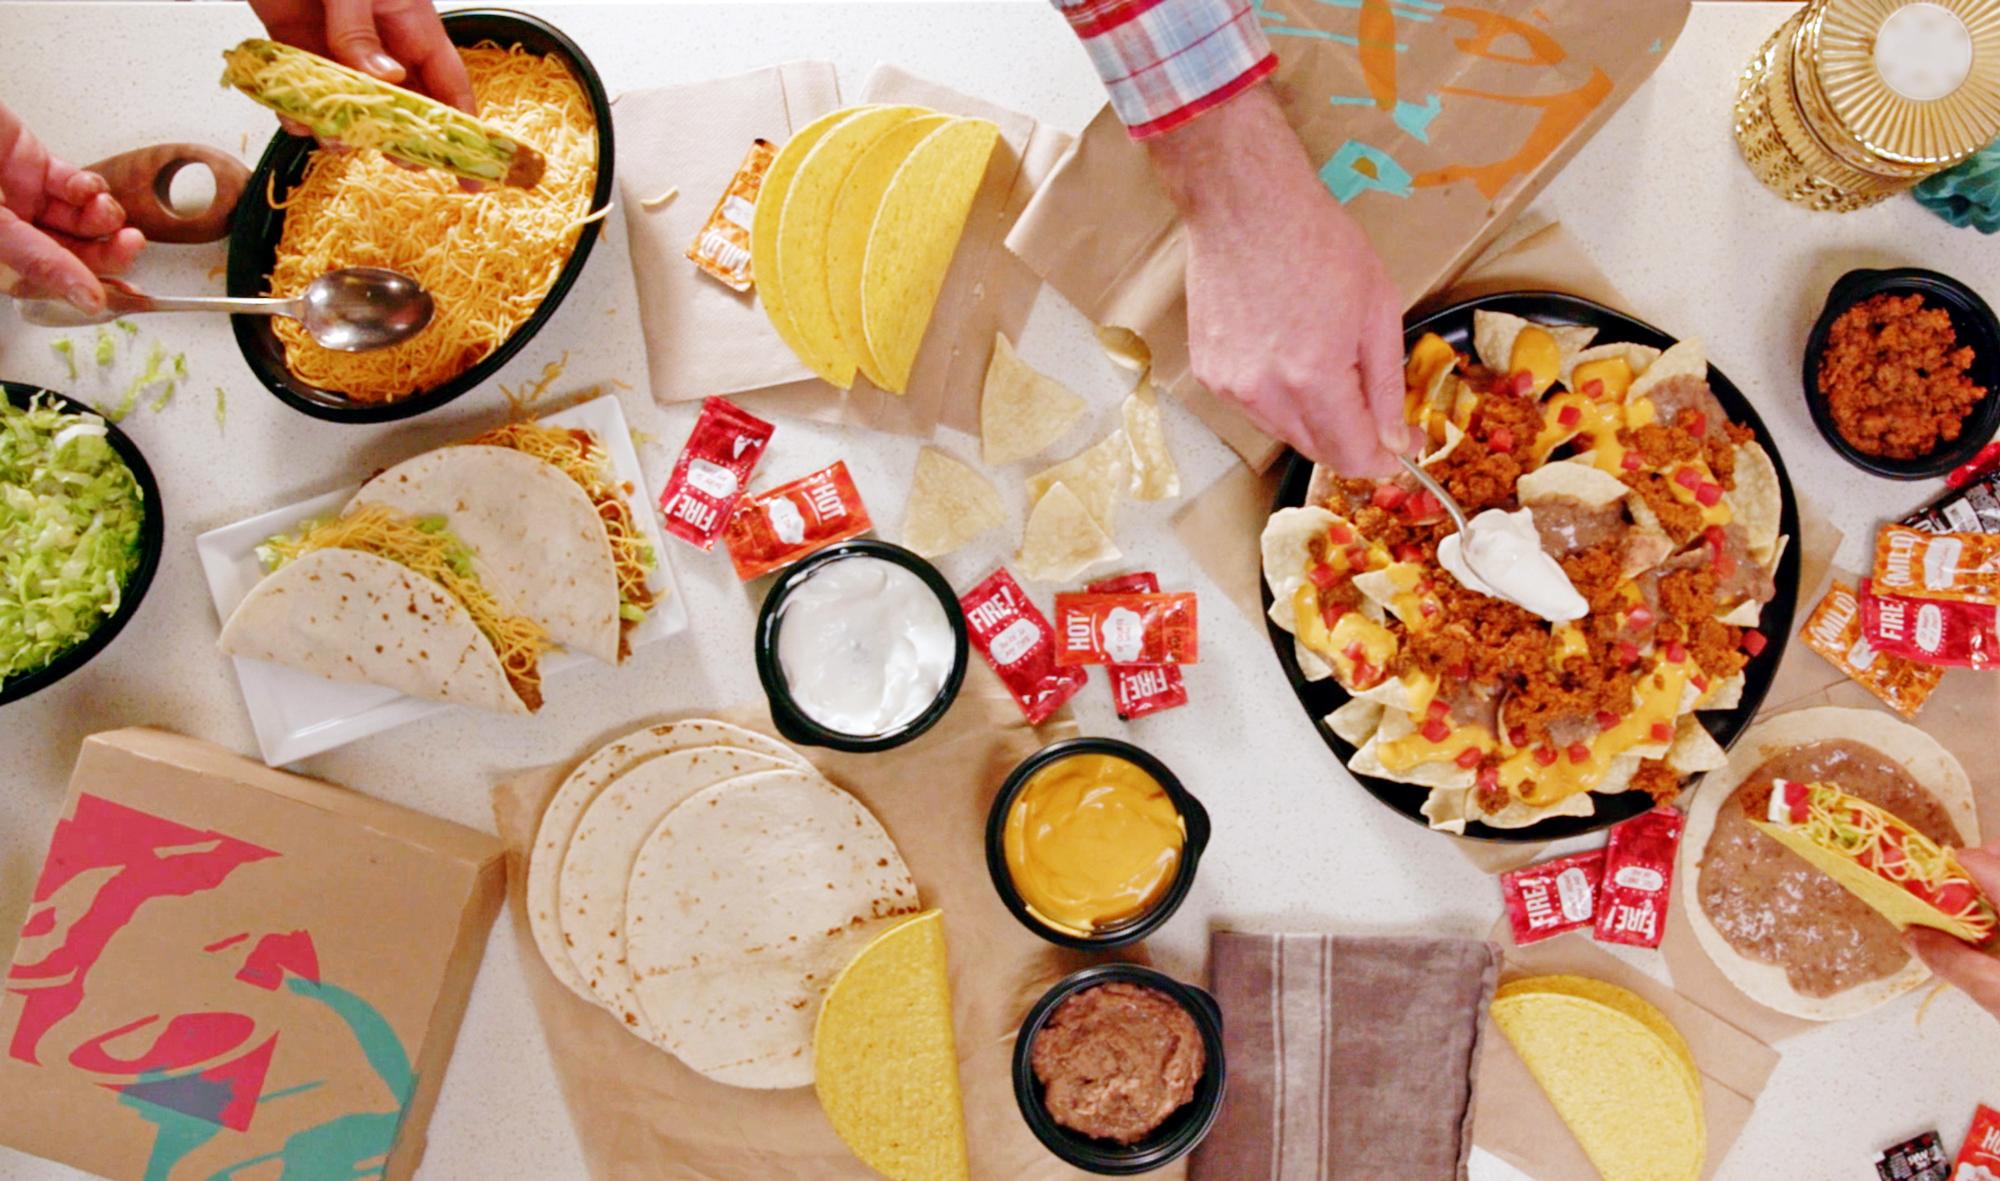 Taco Bell Offers Taco Bar Kits